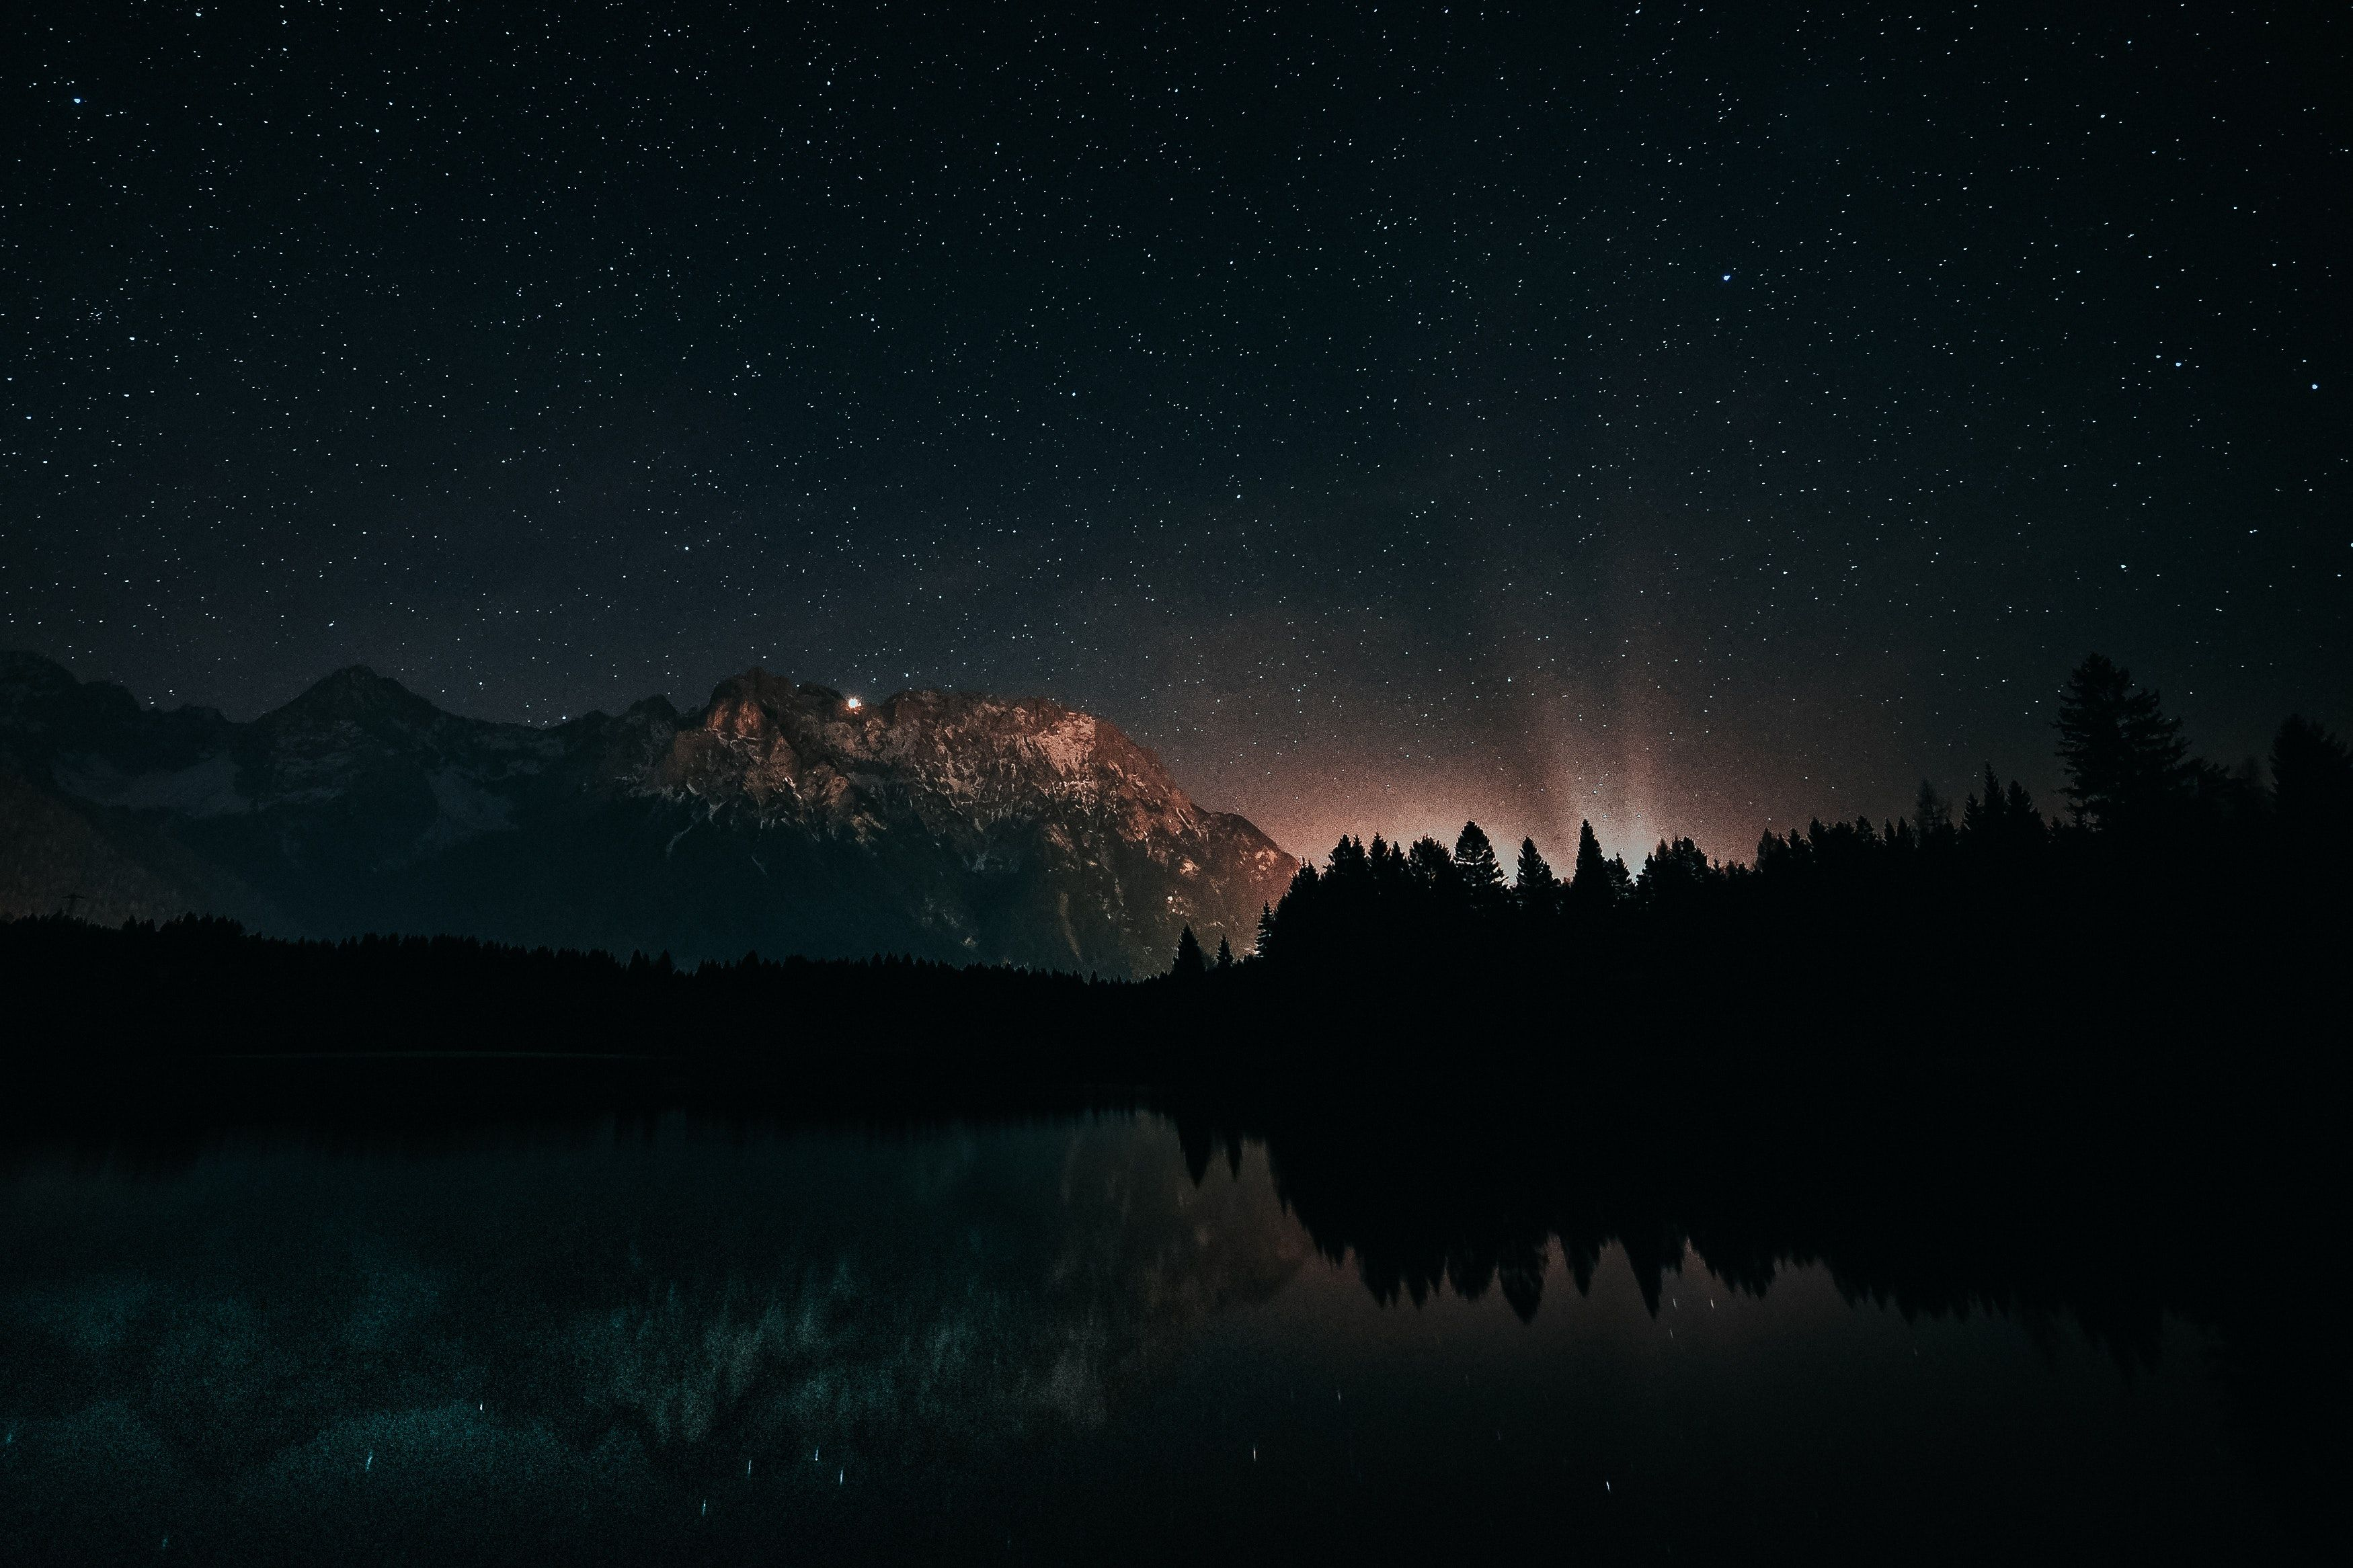 Beautiful Sky At Night Wallpaper Free Download - Beautiful Night Dark Wallpaper Hd - HD Wallpaper